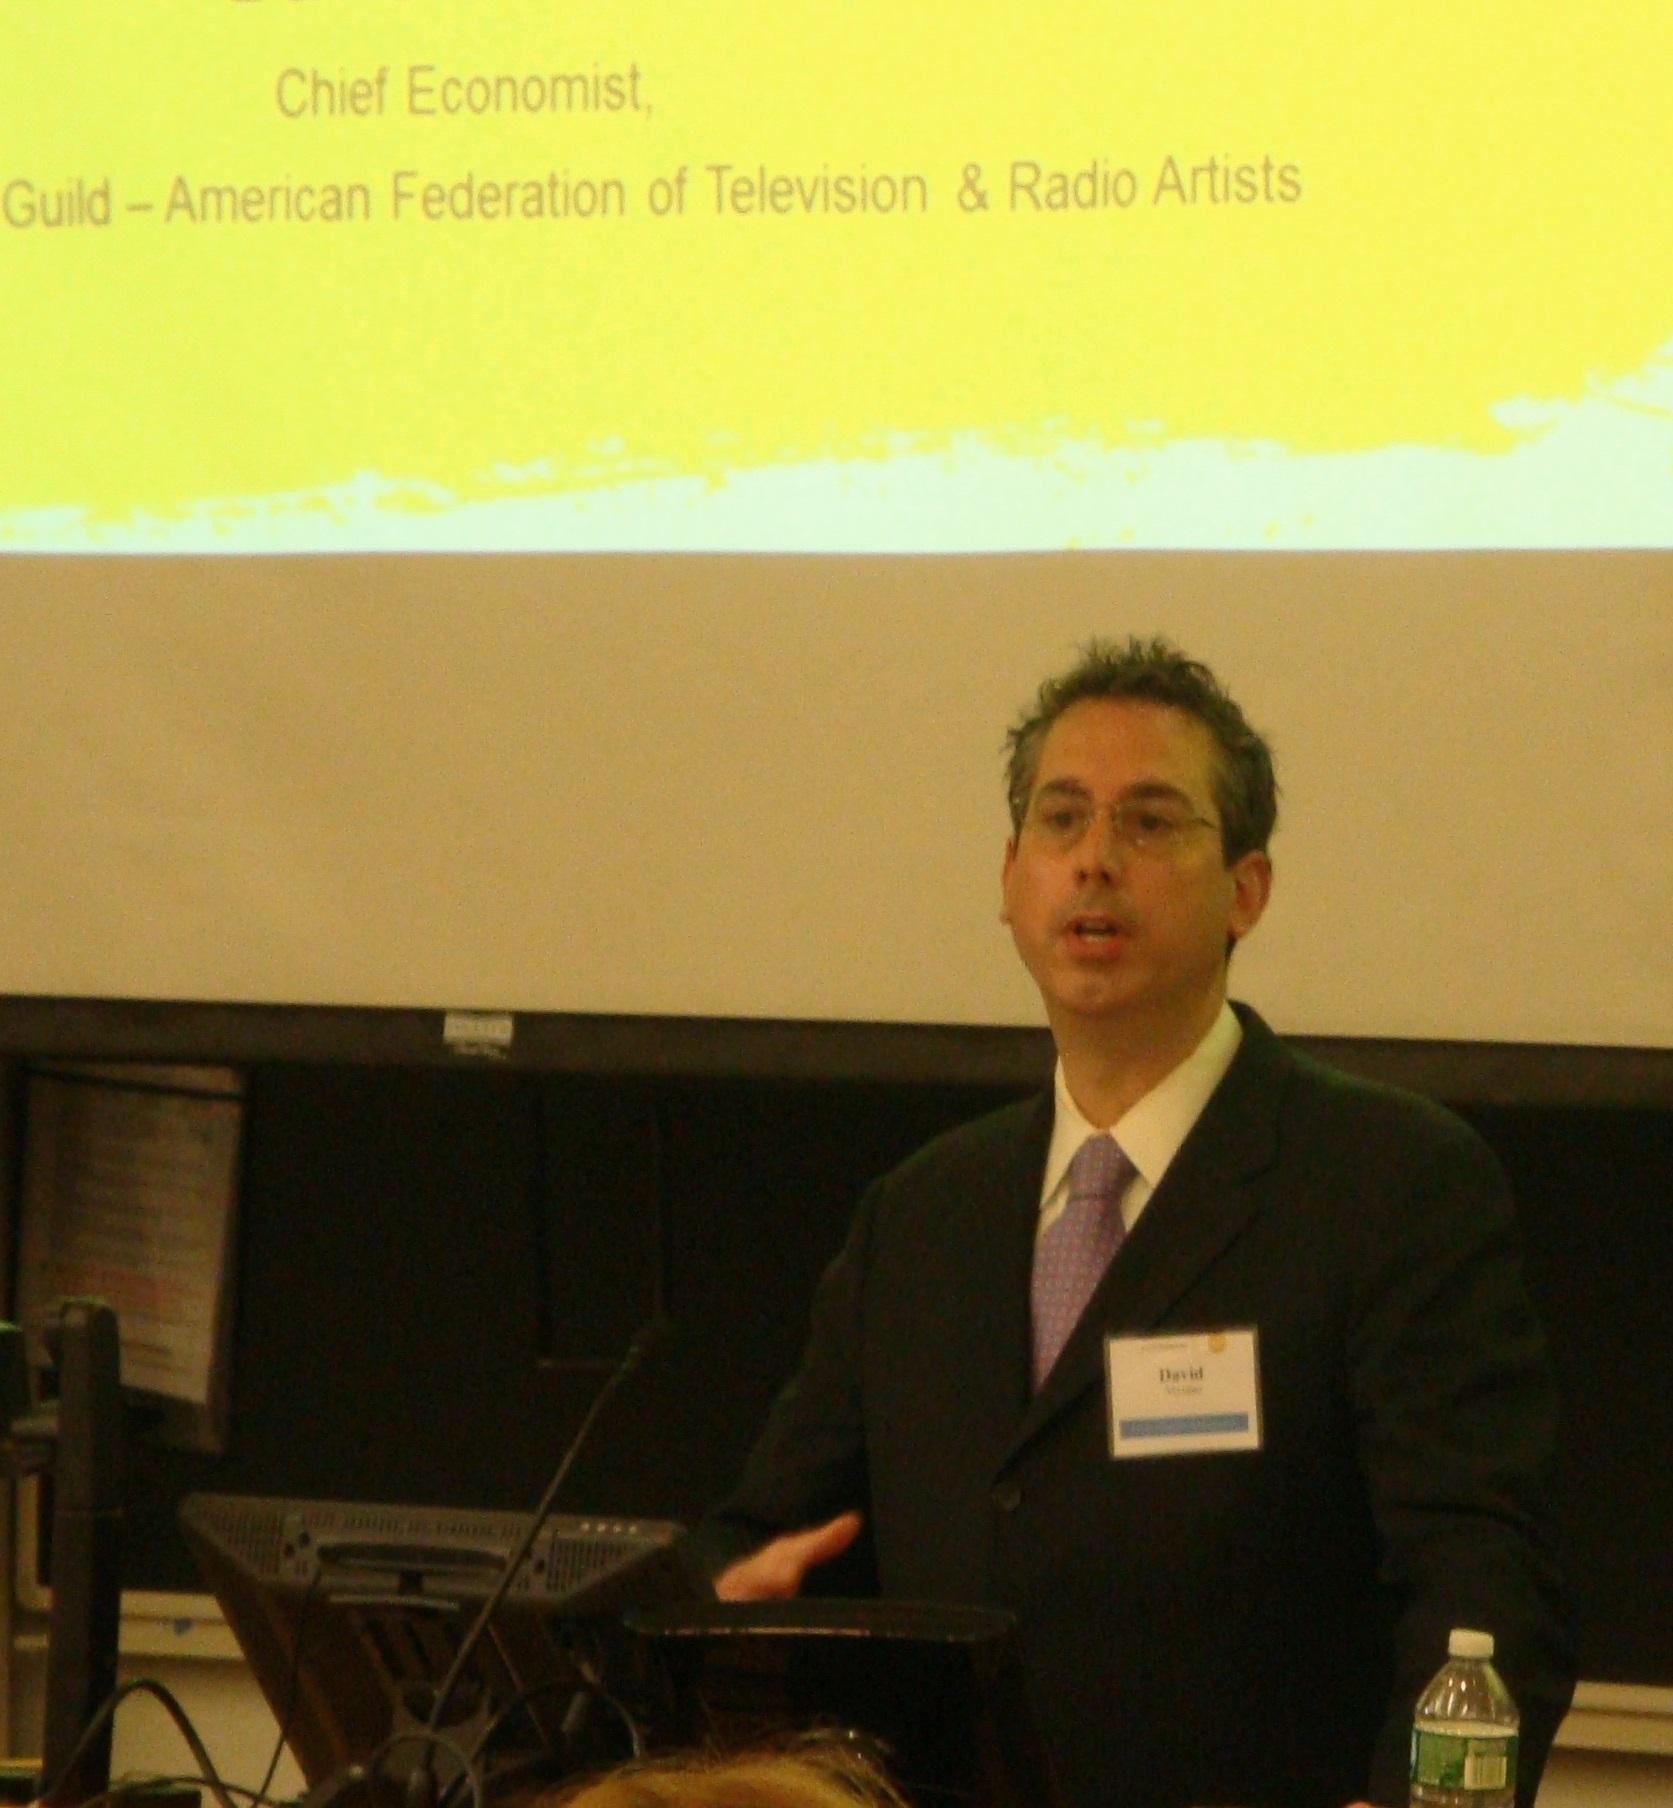 David Viviano